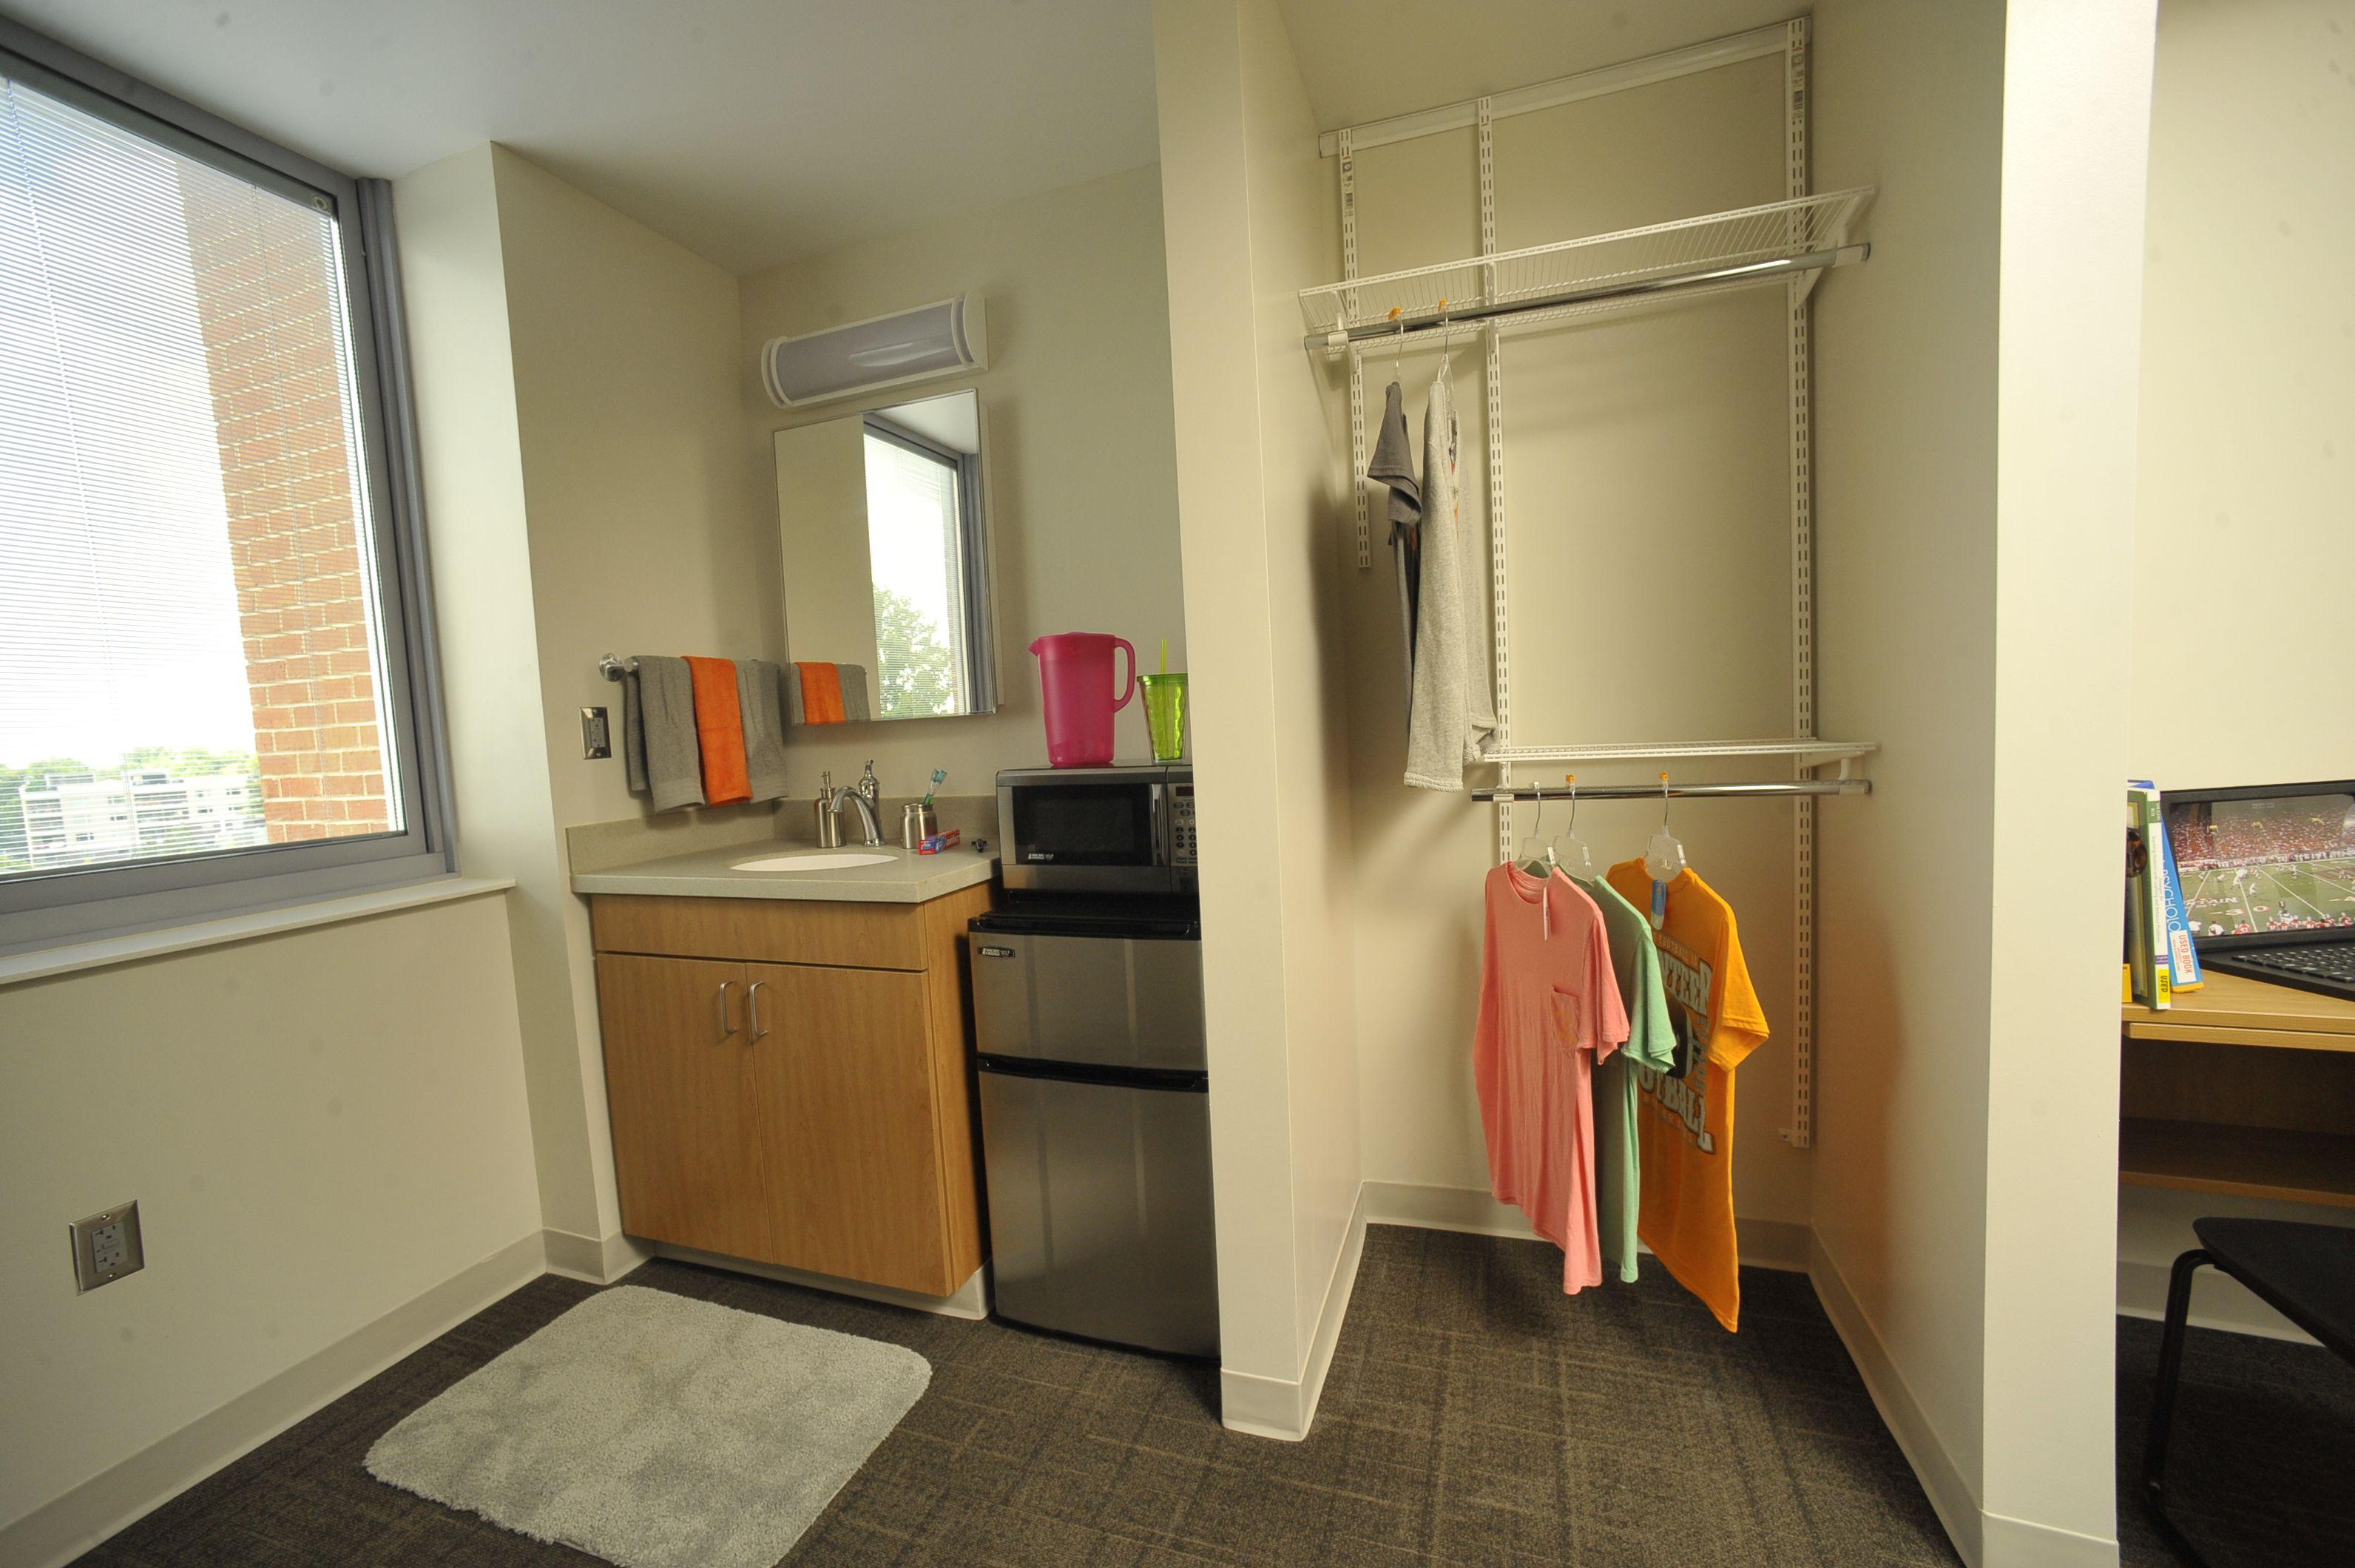 University Of Tennessee Fred D Brown Jr Hall Standard Suite Dorm Planning University Housing Dorm Room Essentials